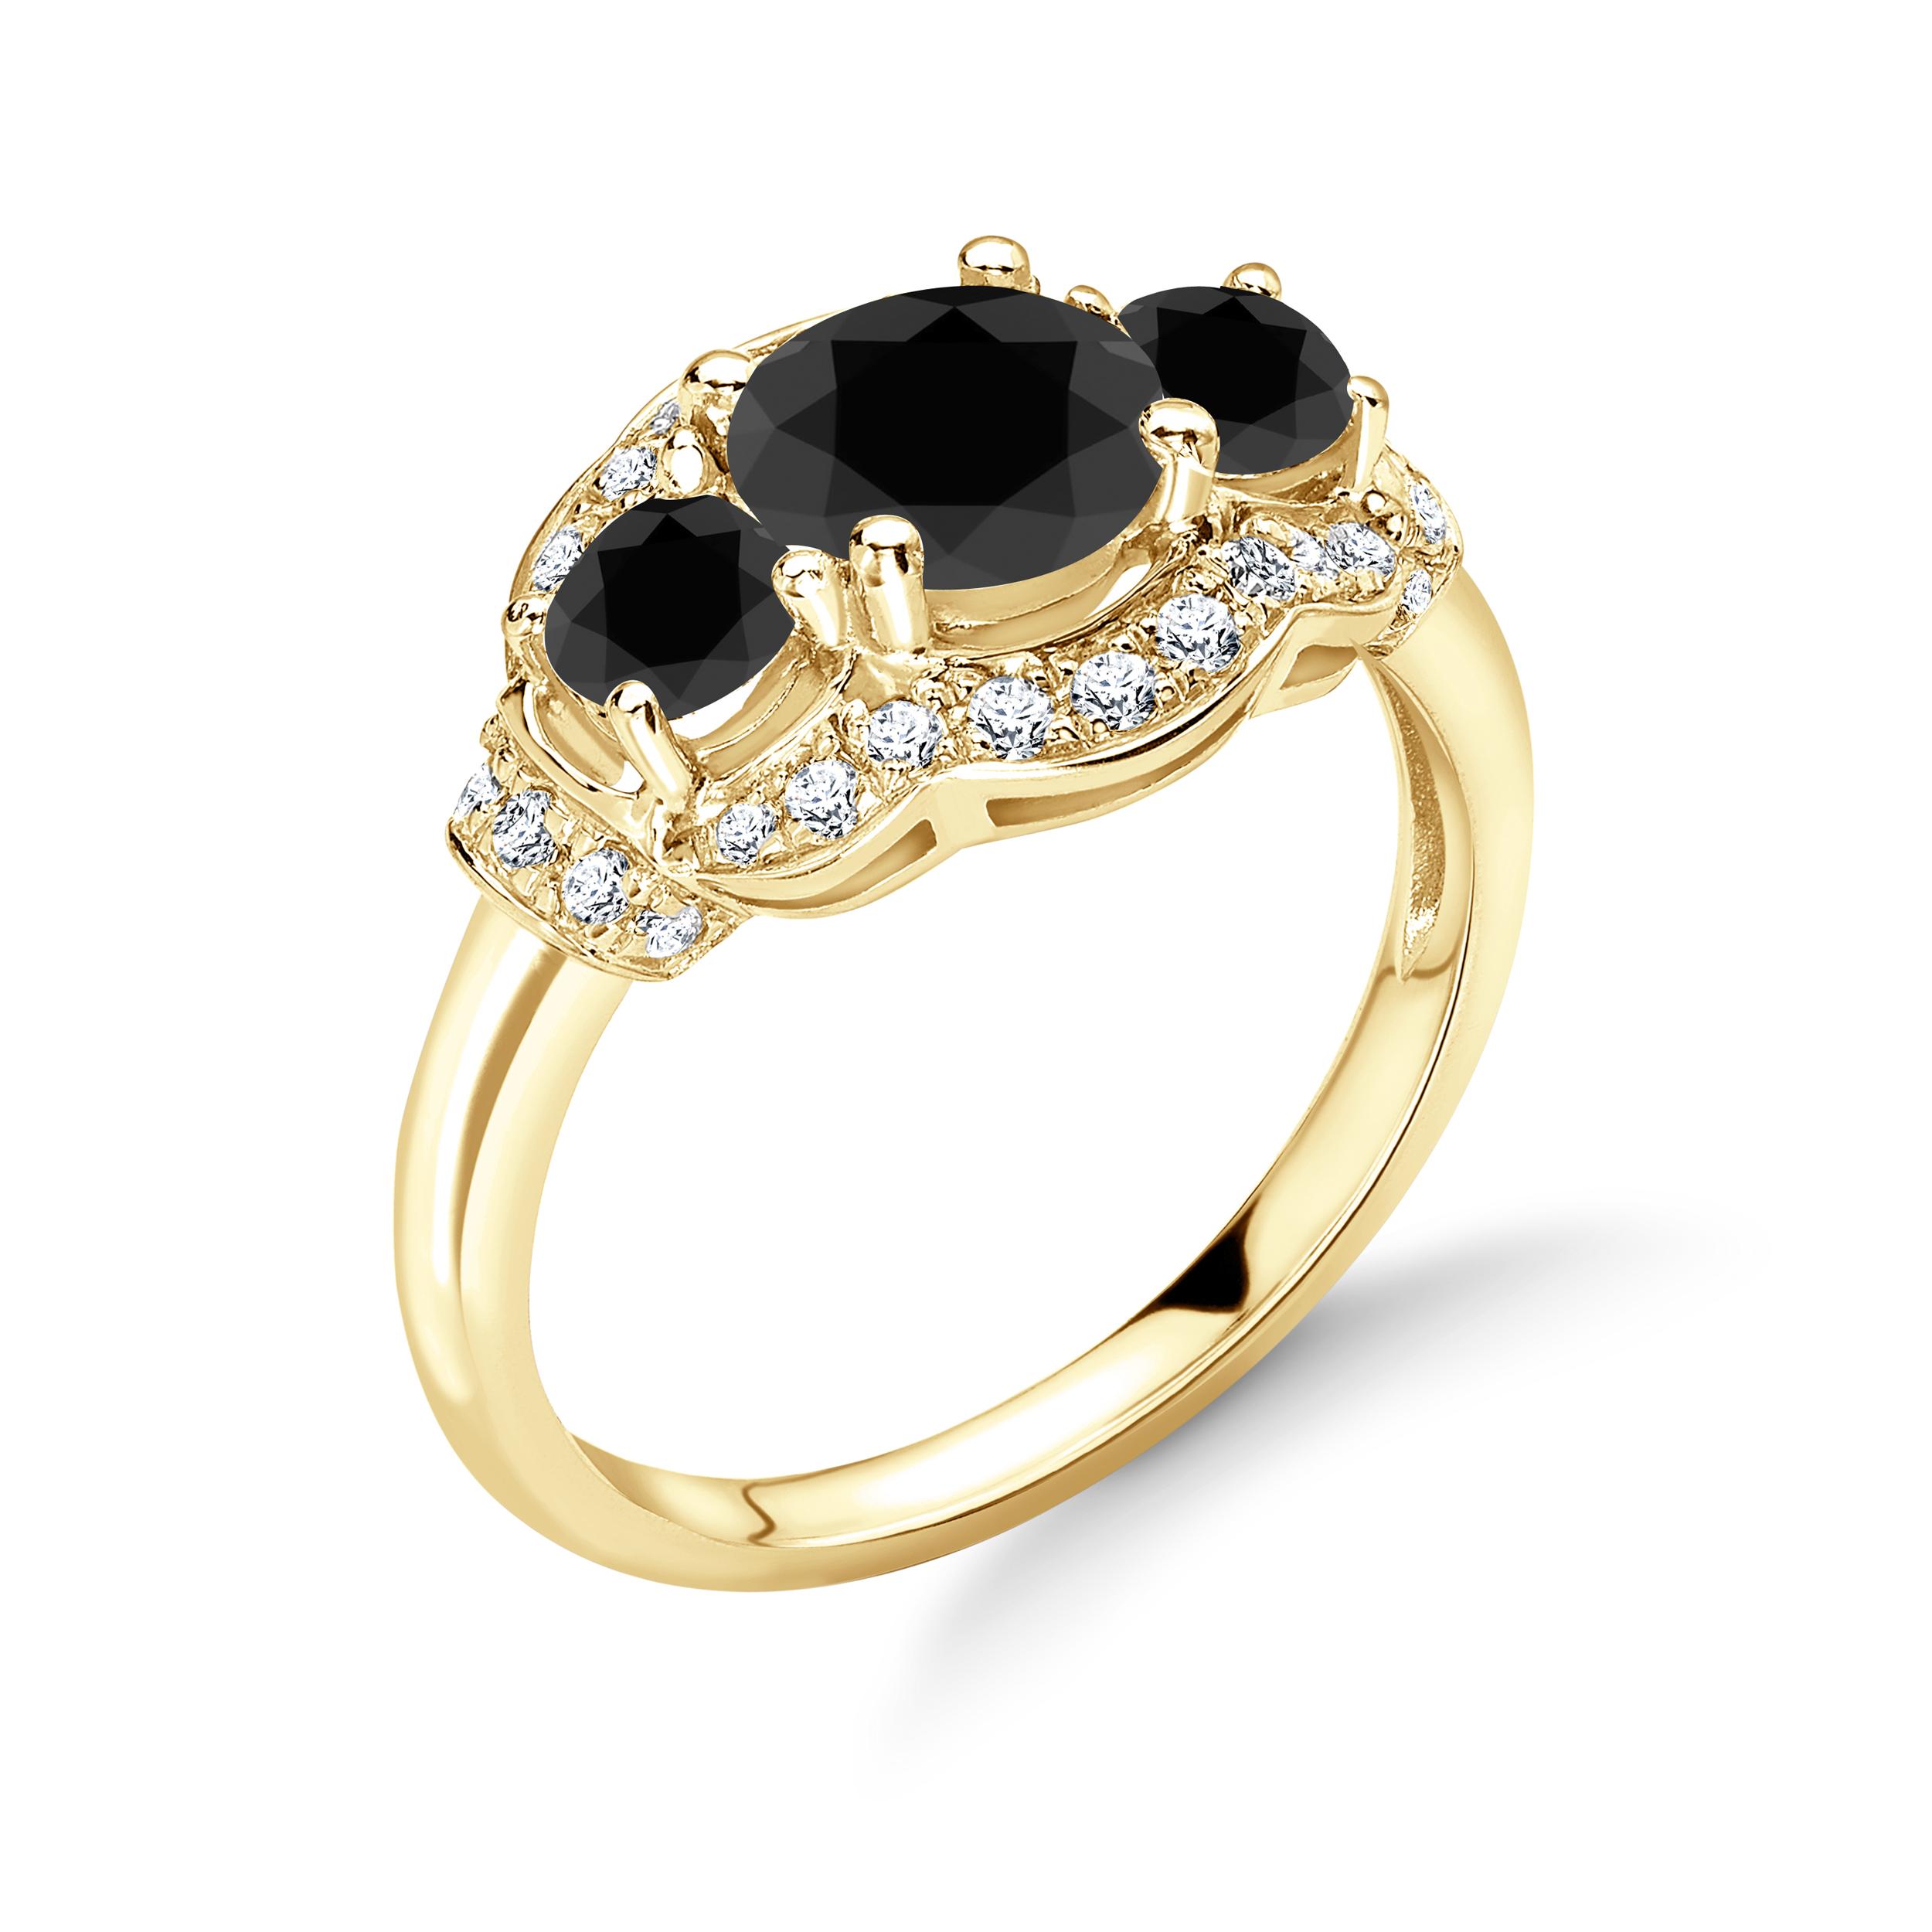 Vintage Style Gorgeous Halo Trilogy Black Diamond Engagement Rings